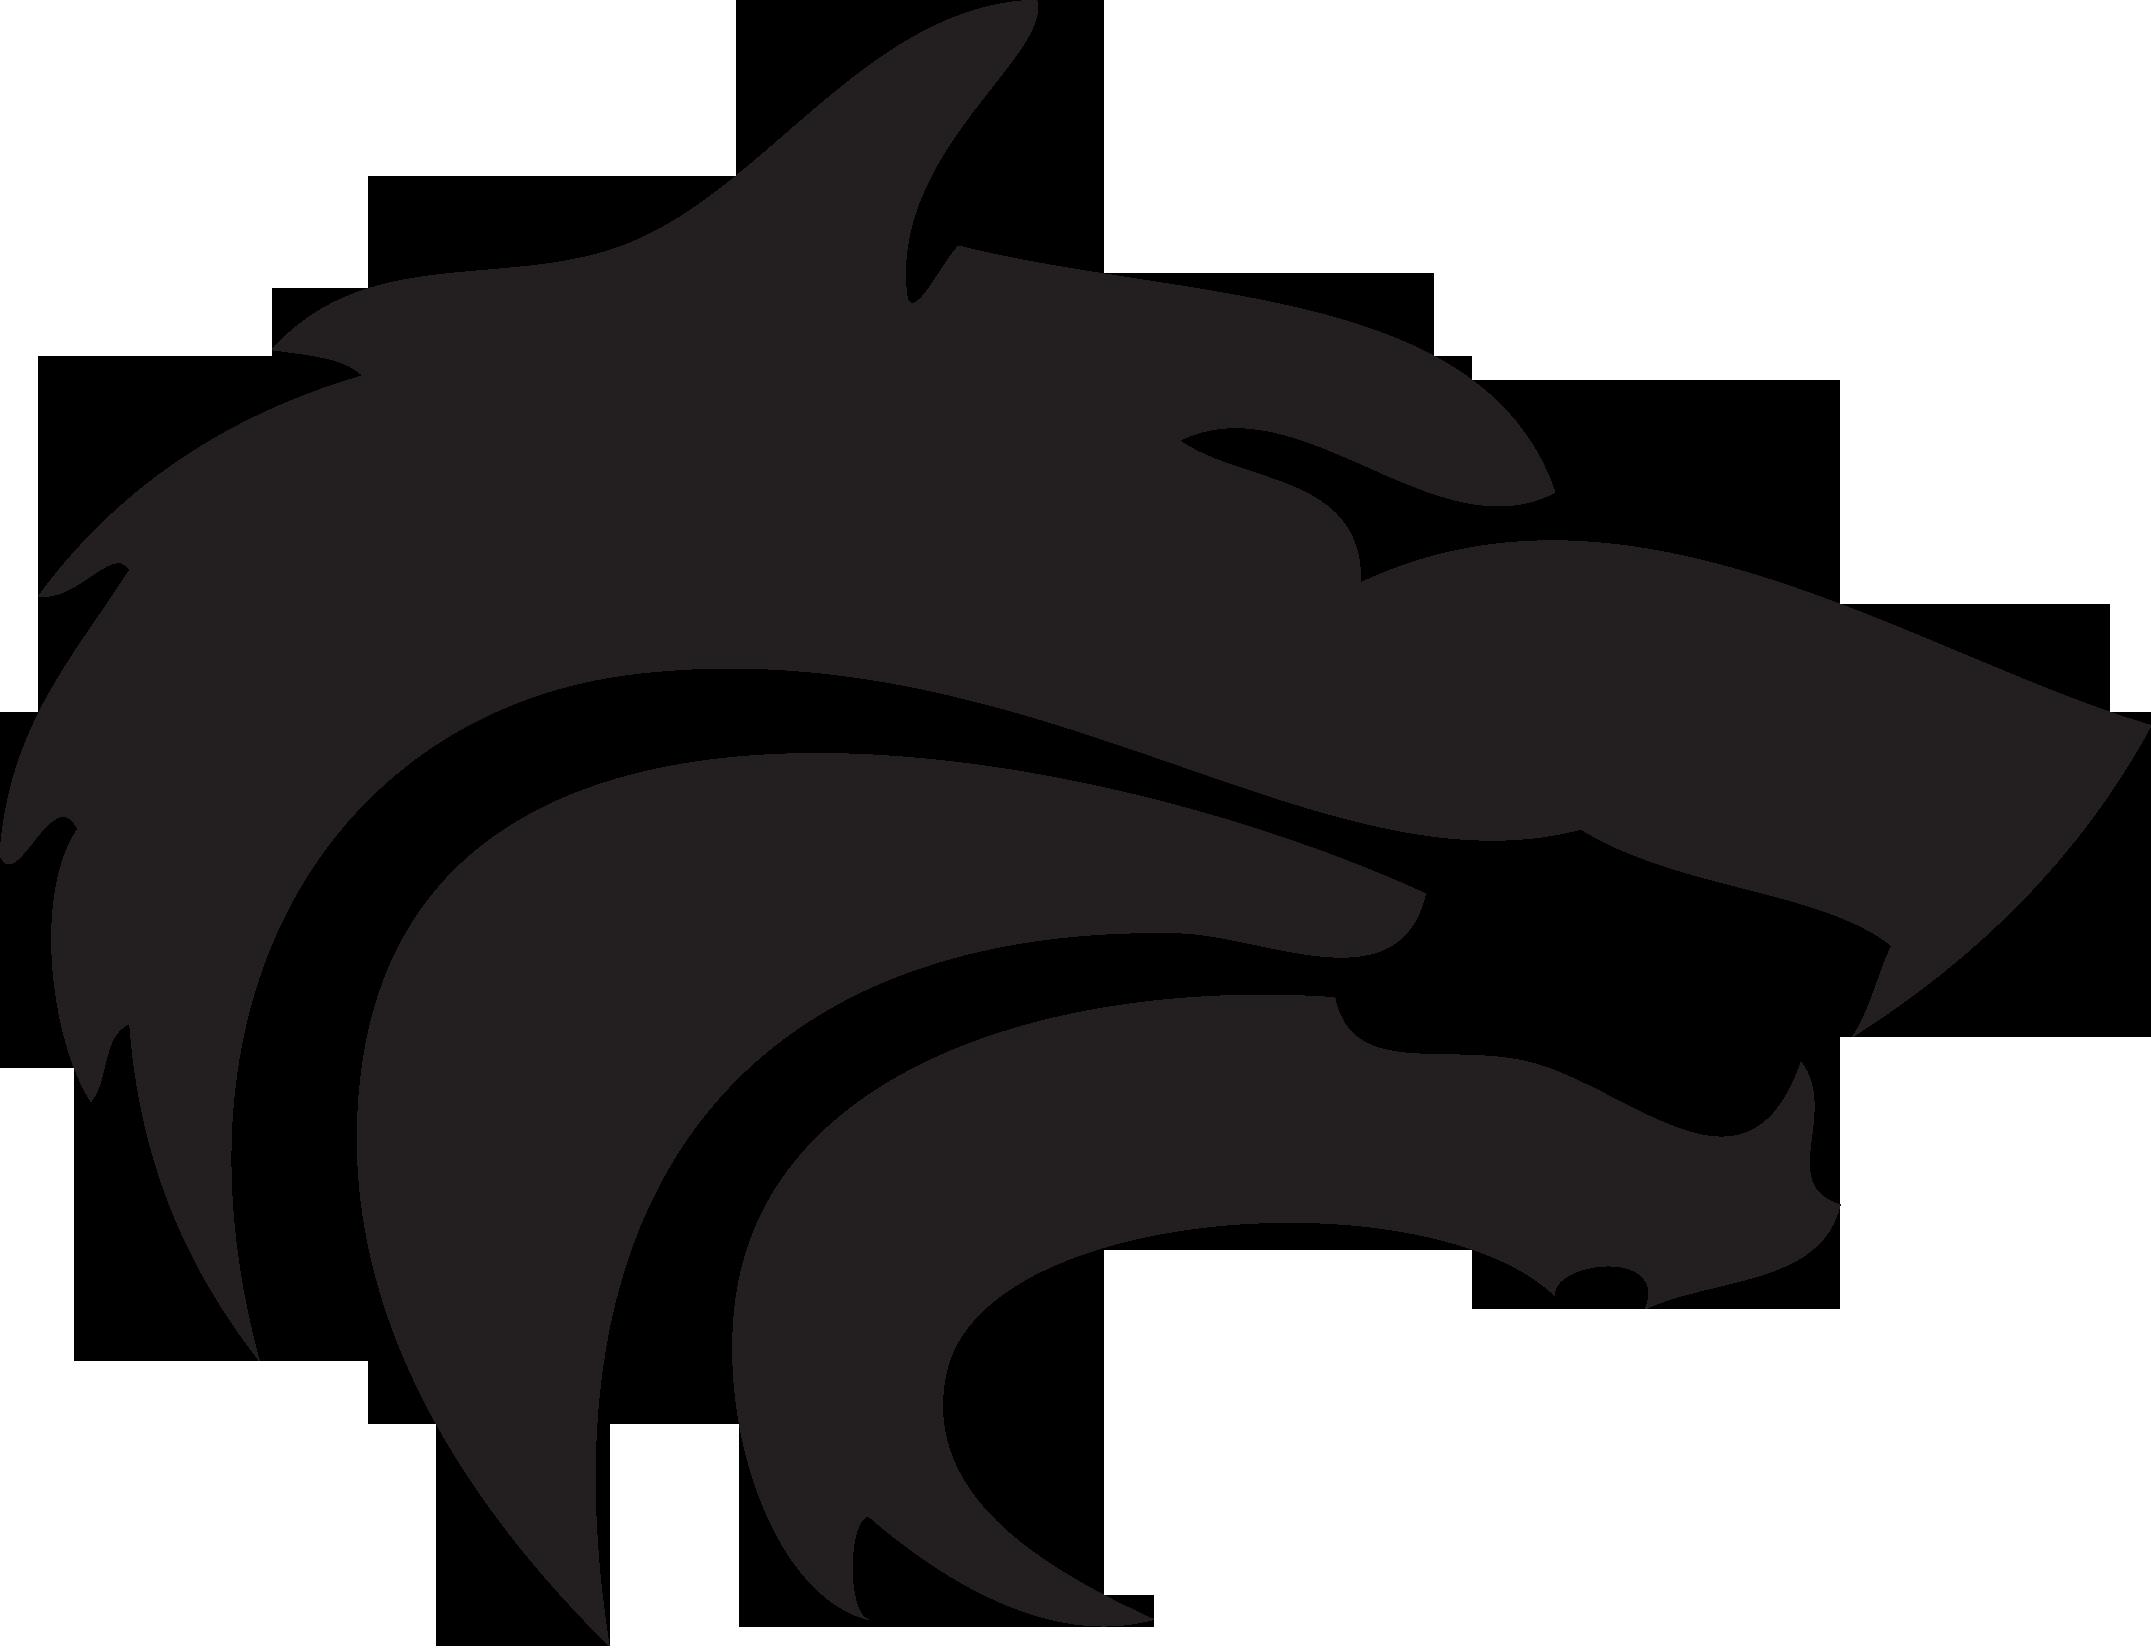 Wolves clipart alpha, Wolves alpha Transparent FREE for ...